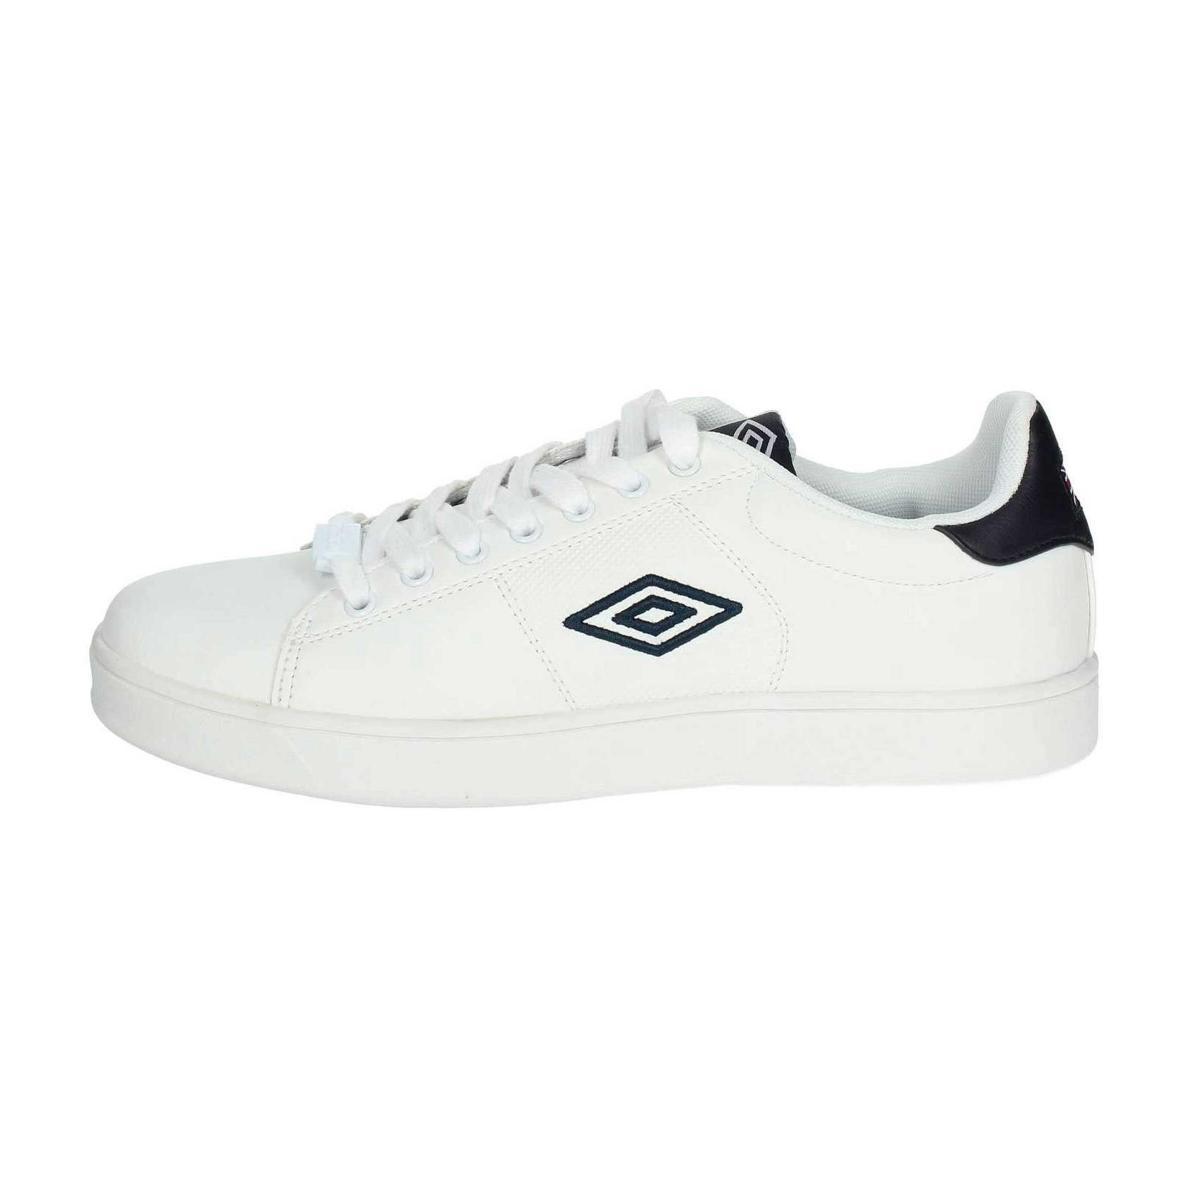 Scarpe Sneakers Umbro basse da uomo rif. RFP38001S